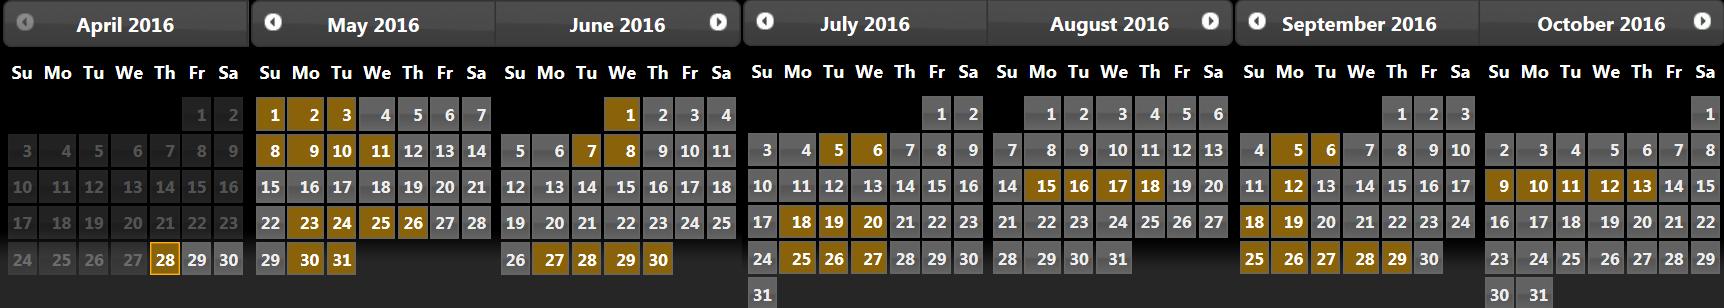 excalibur-calendar